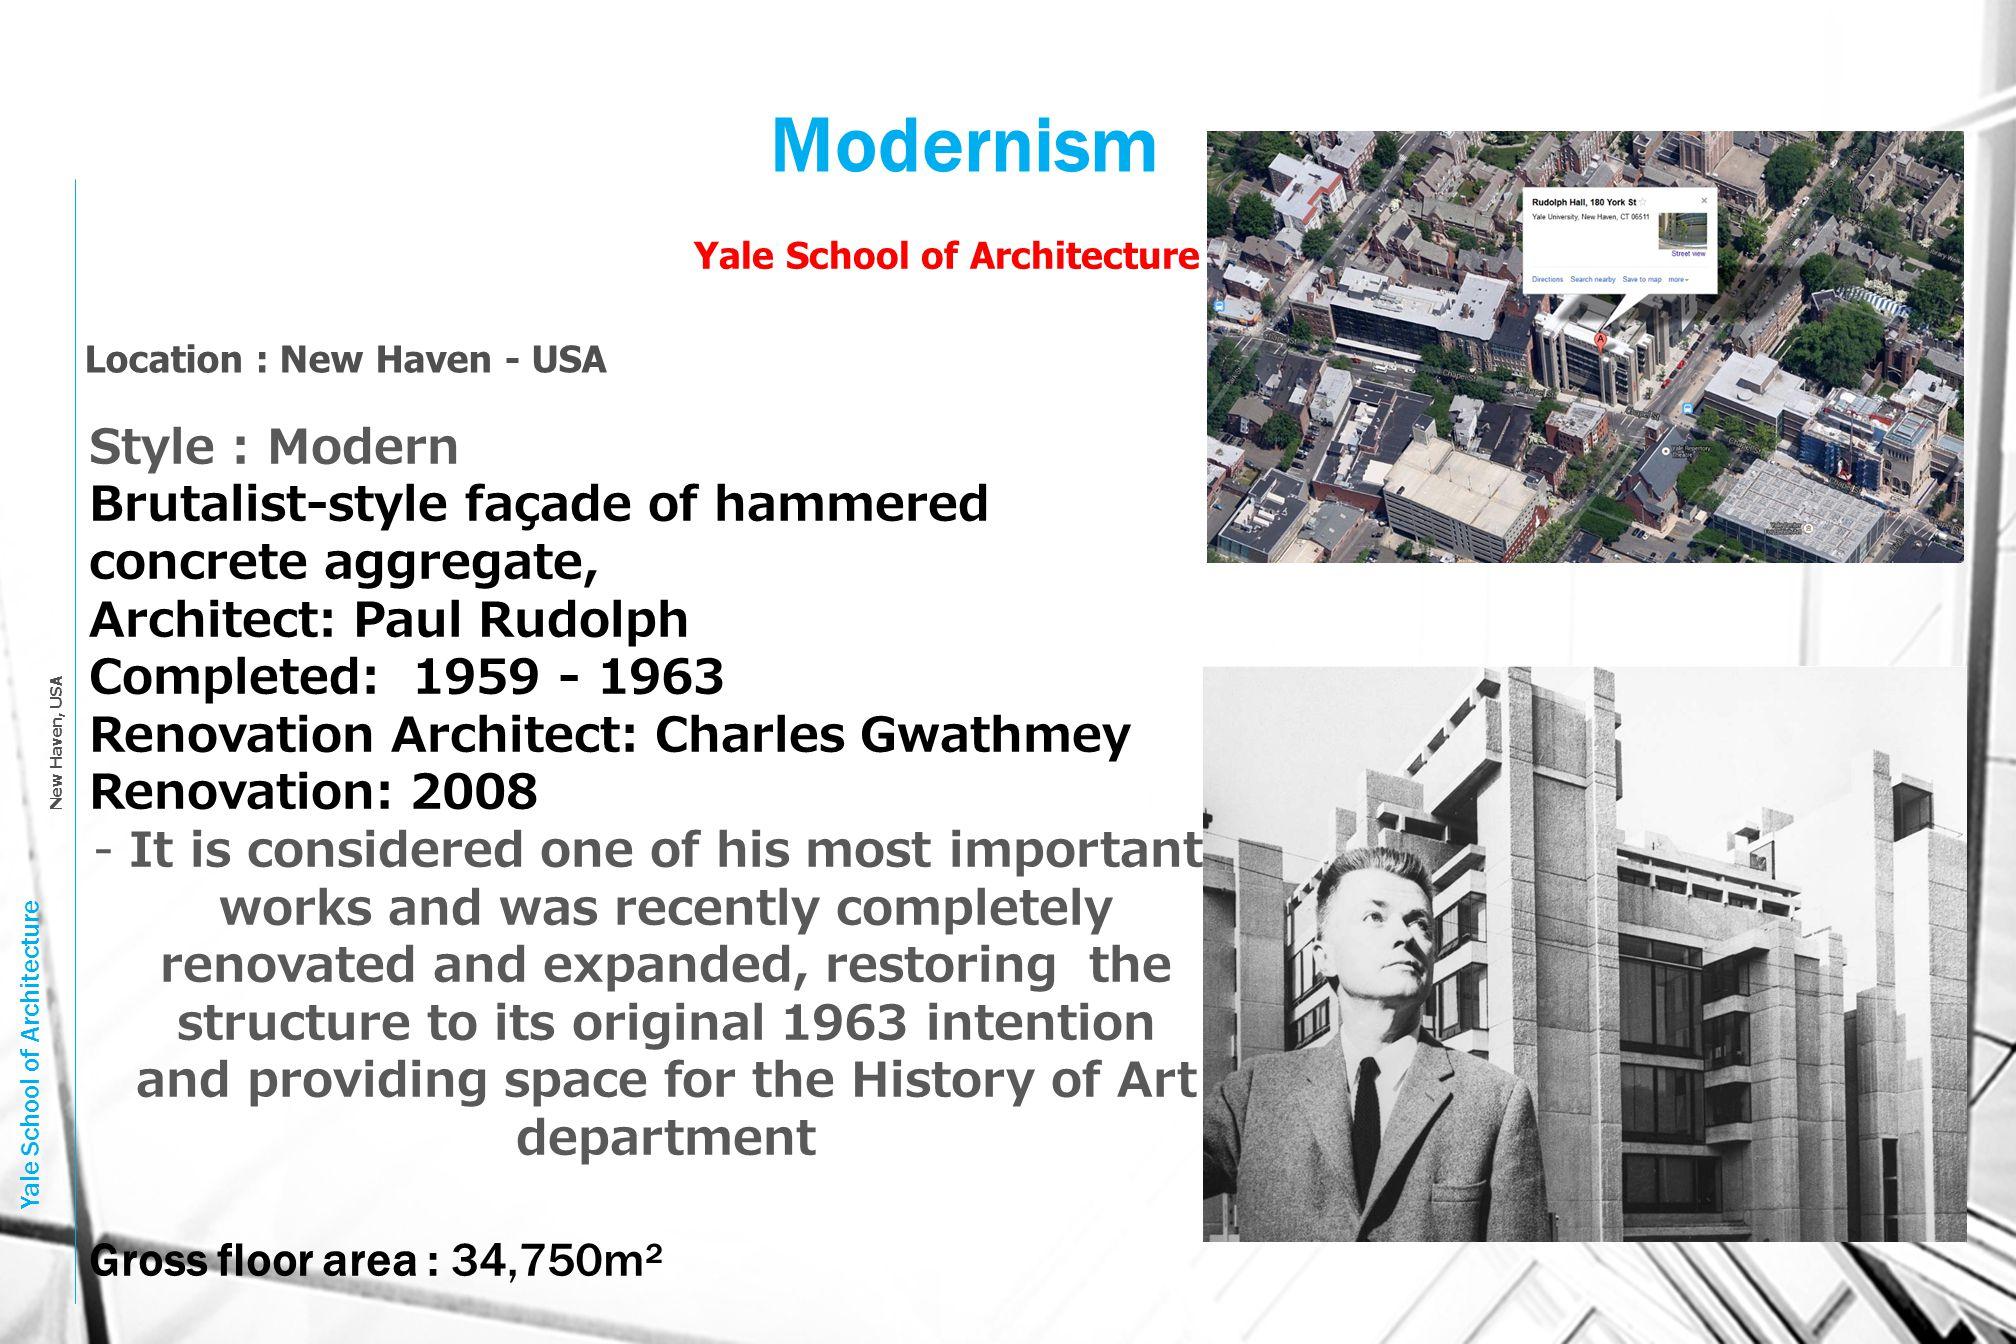 Modernism Style : Modern